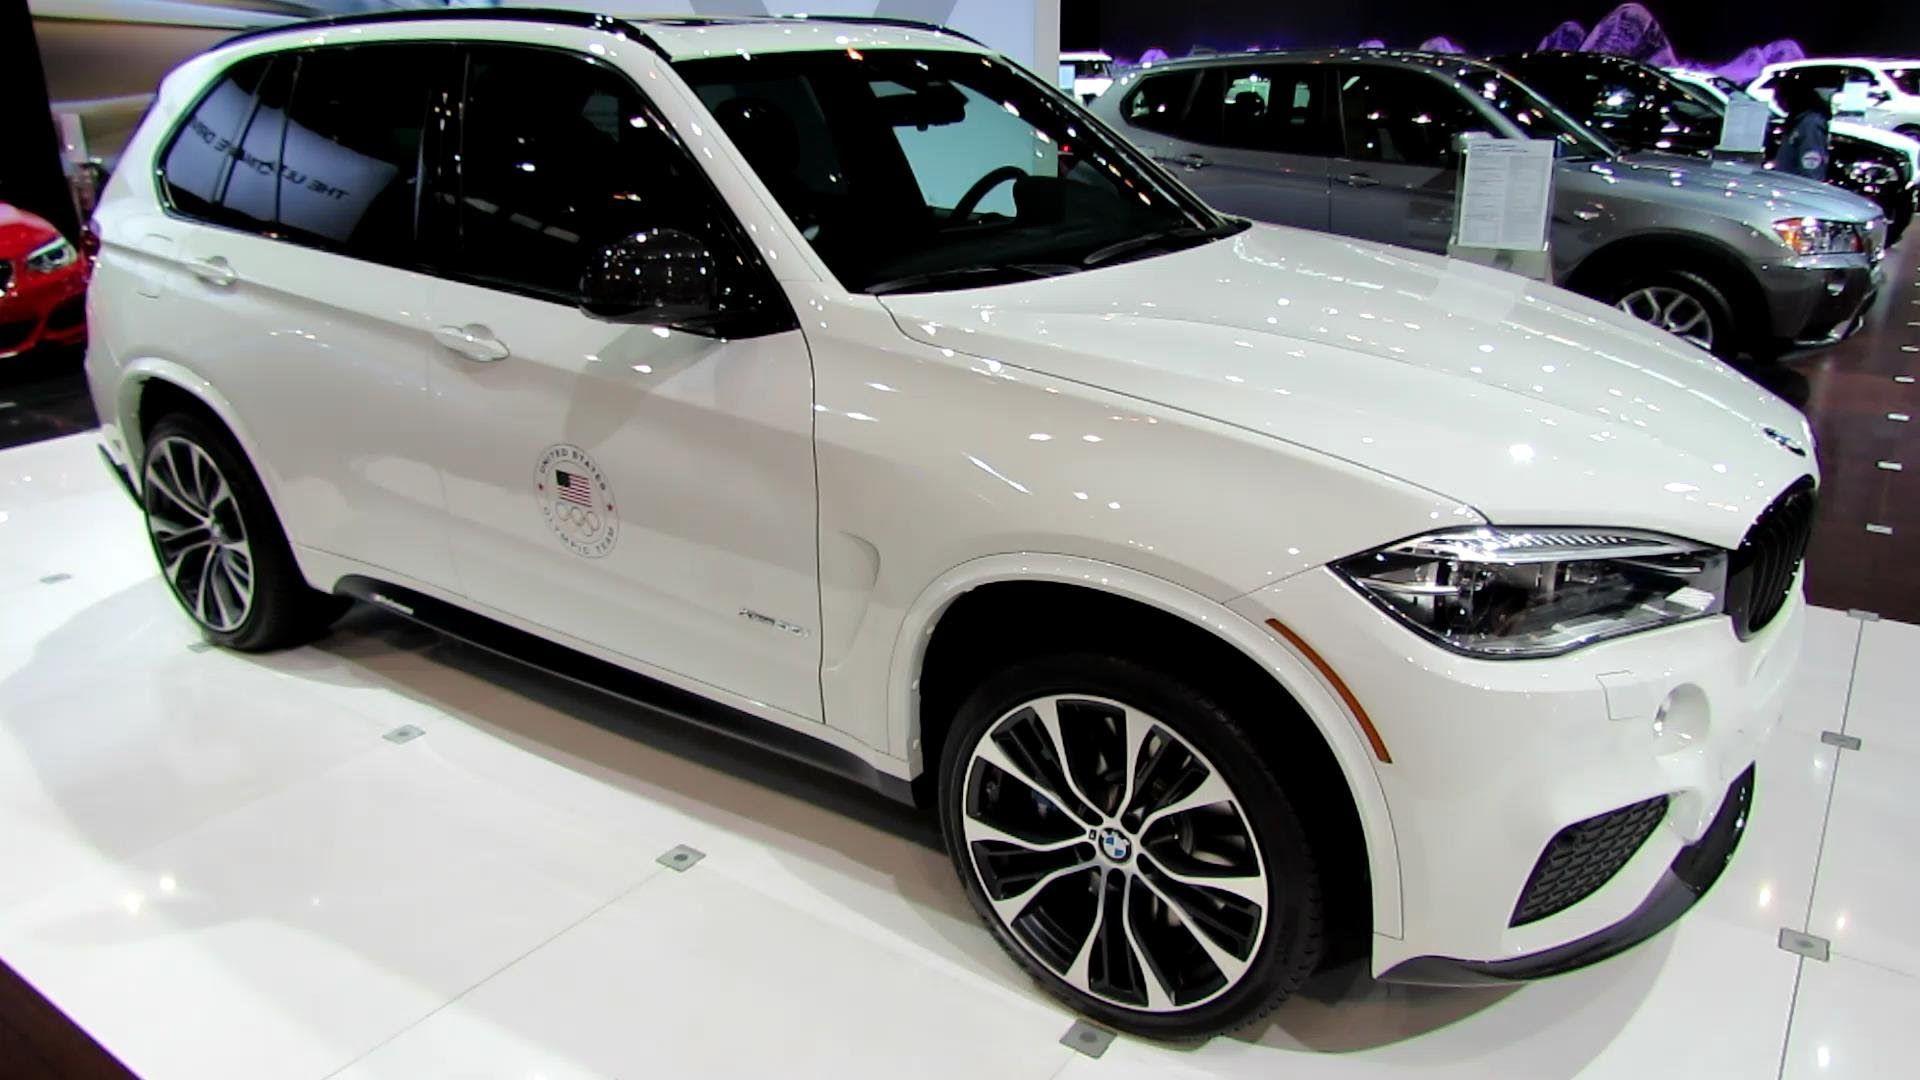 2014 bmw x5 xdrive 35i m performance exterior and interior walkaround